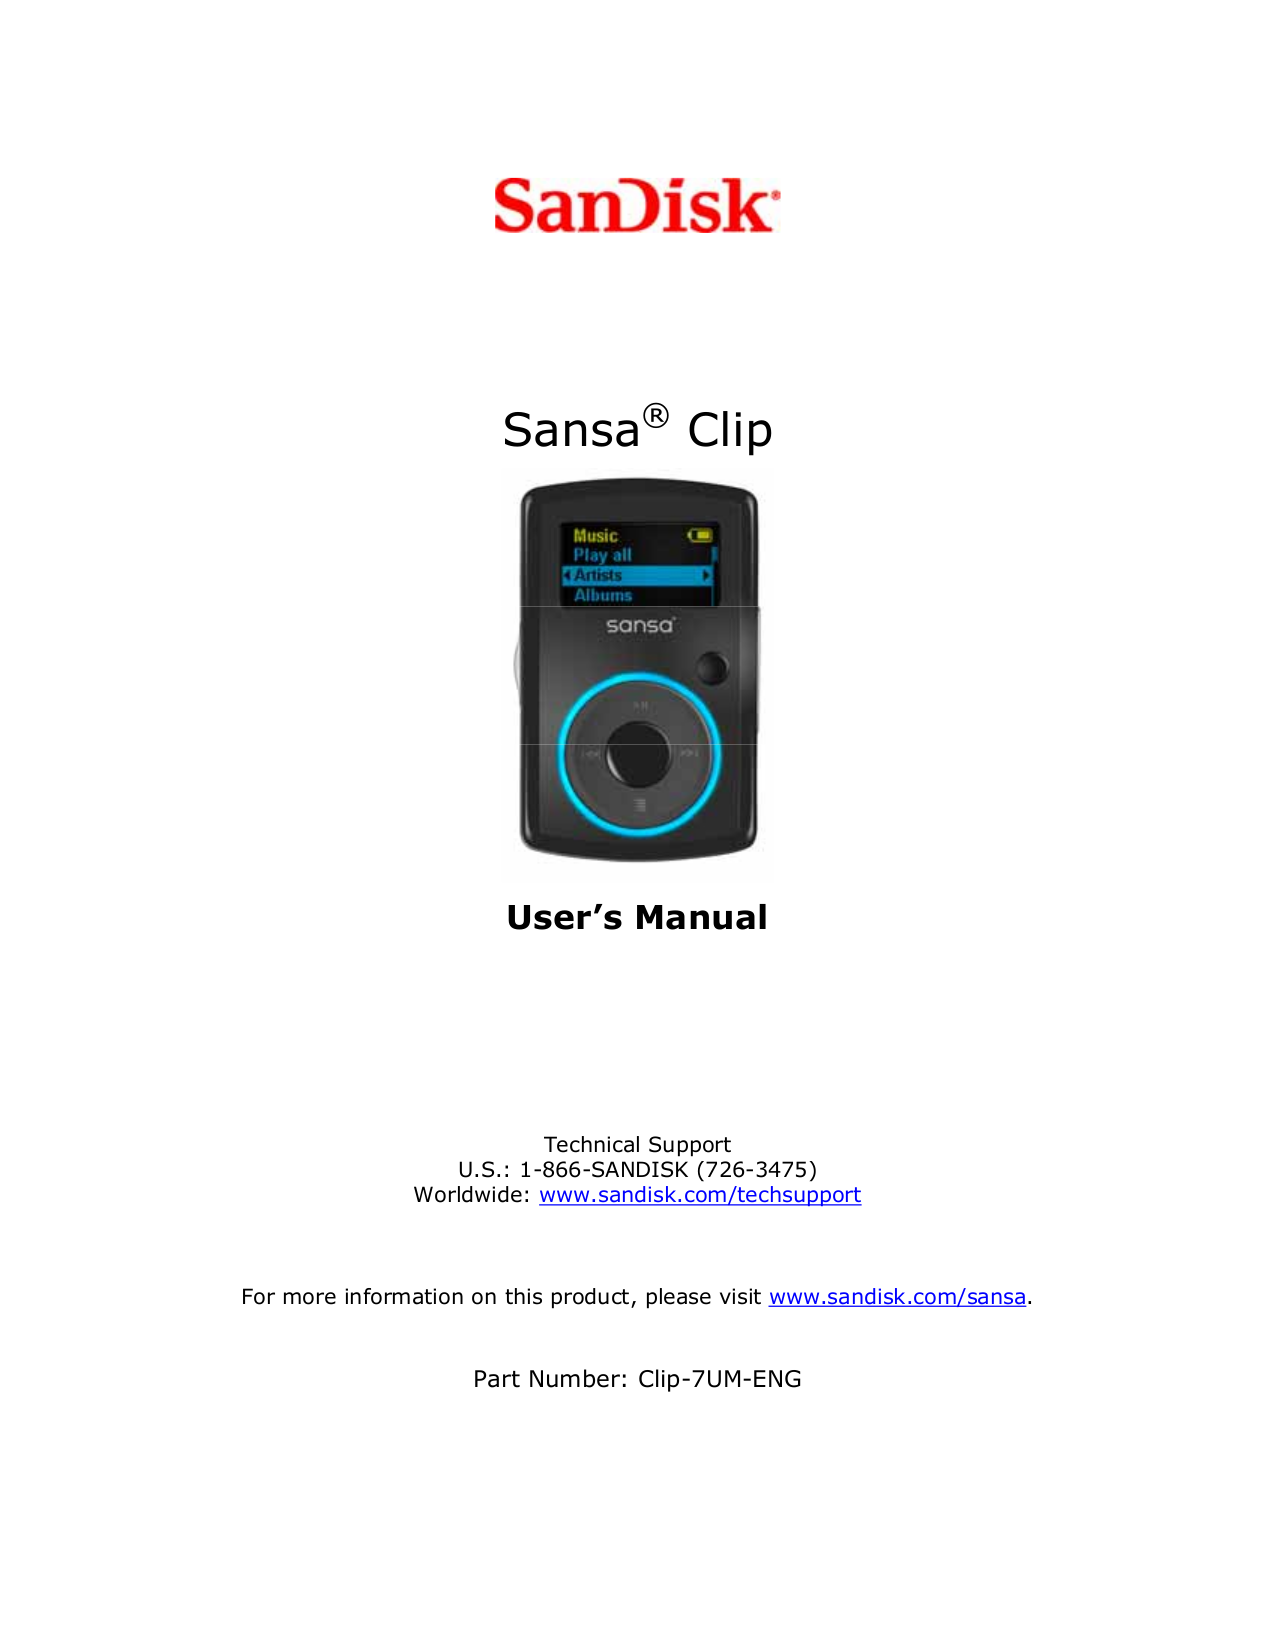 download free pdf for sandisk sansa sansa connect 4gb mp3 player manual rh umlib com Toshiba Hard Drive Sansa Sansa Media Converter